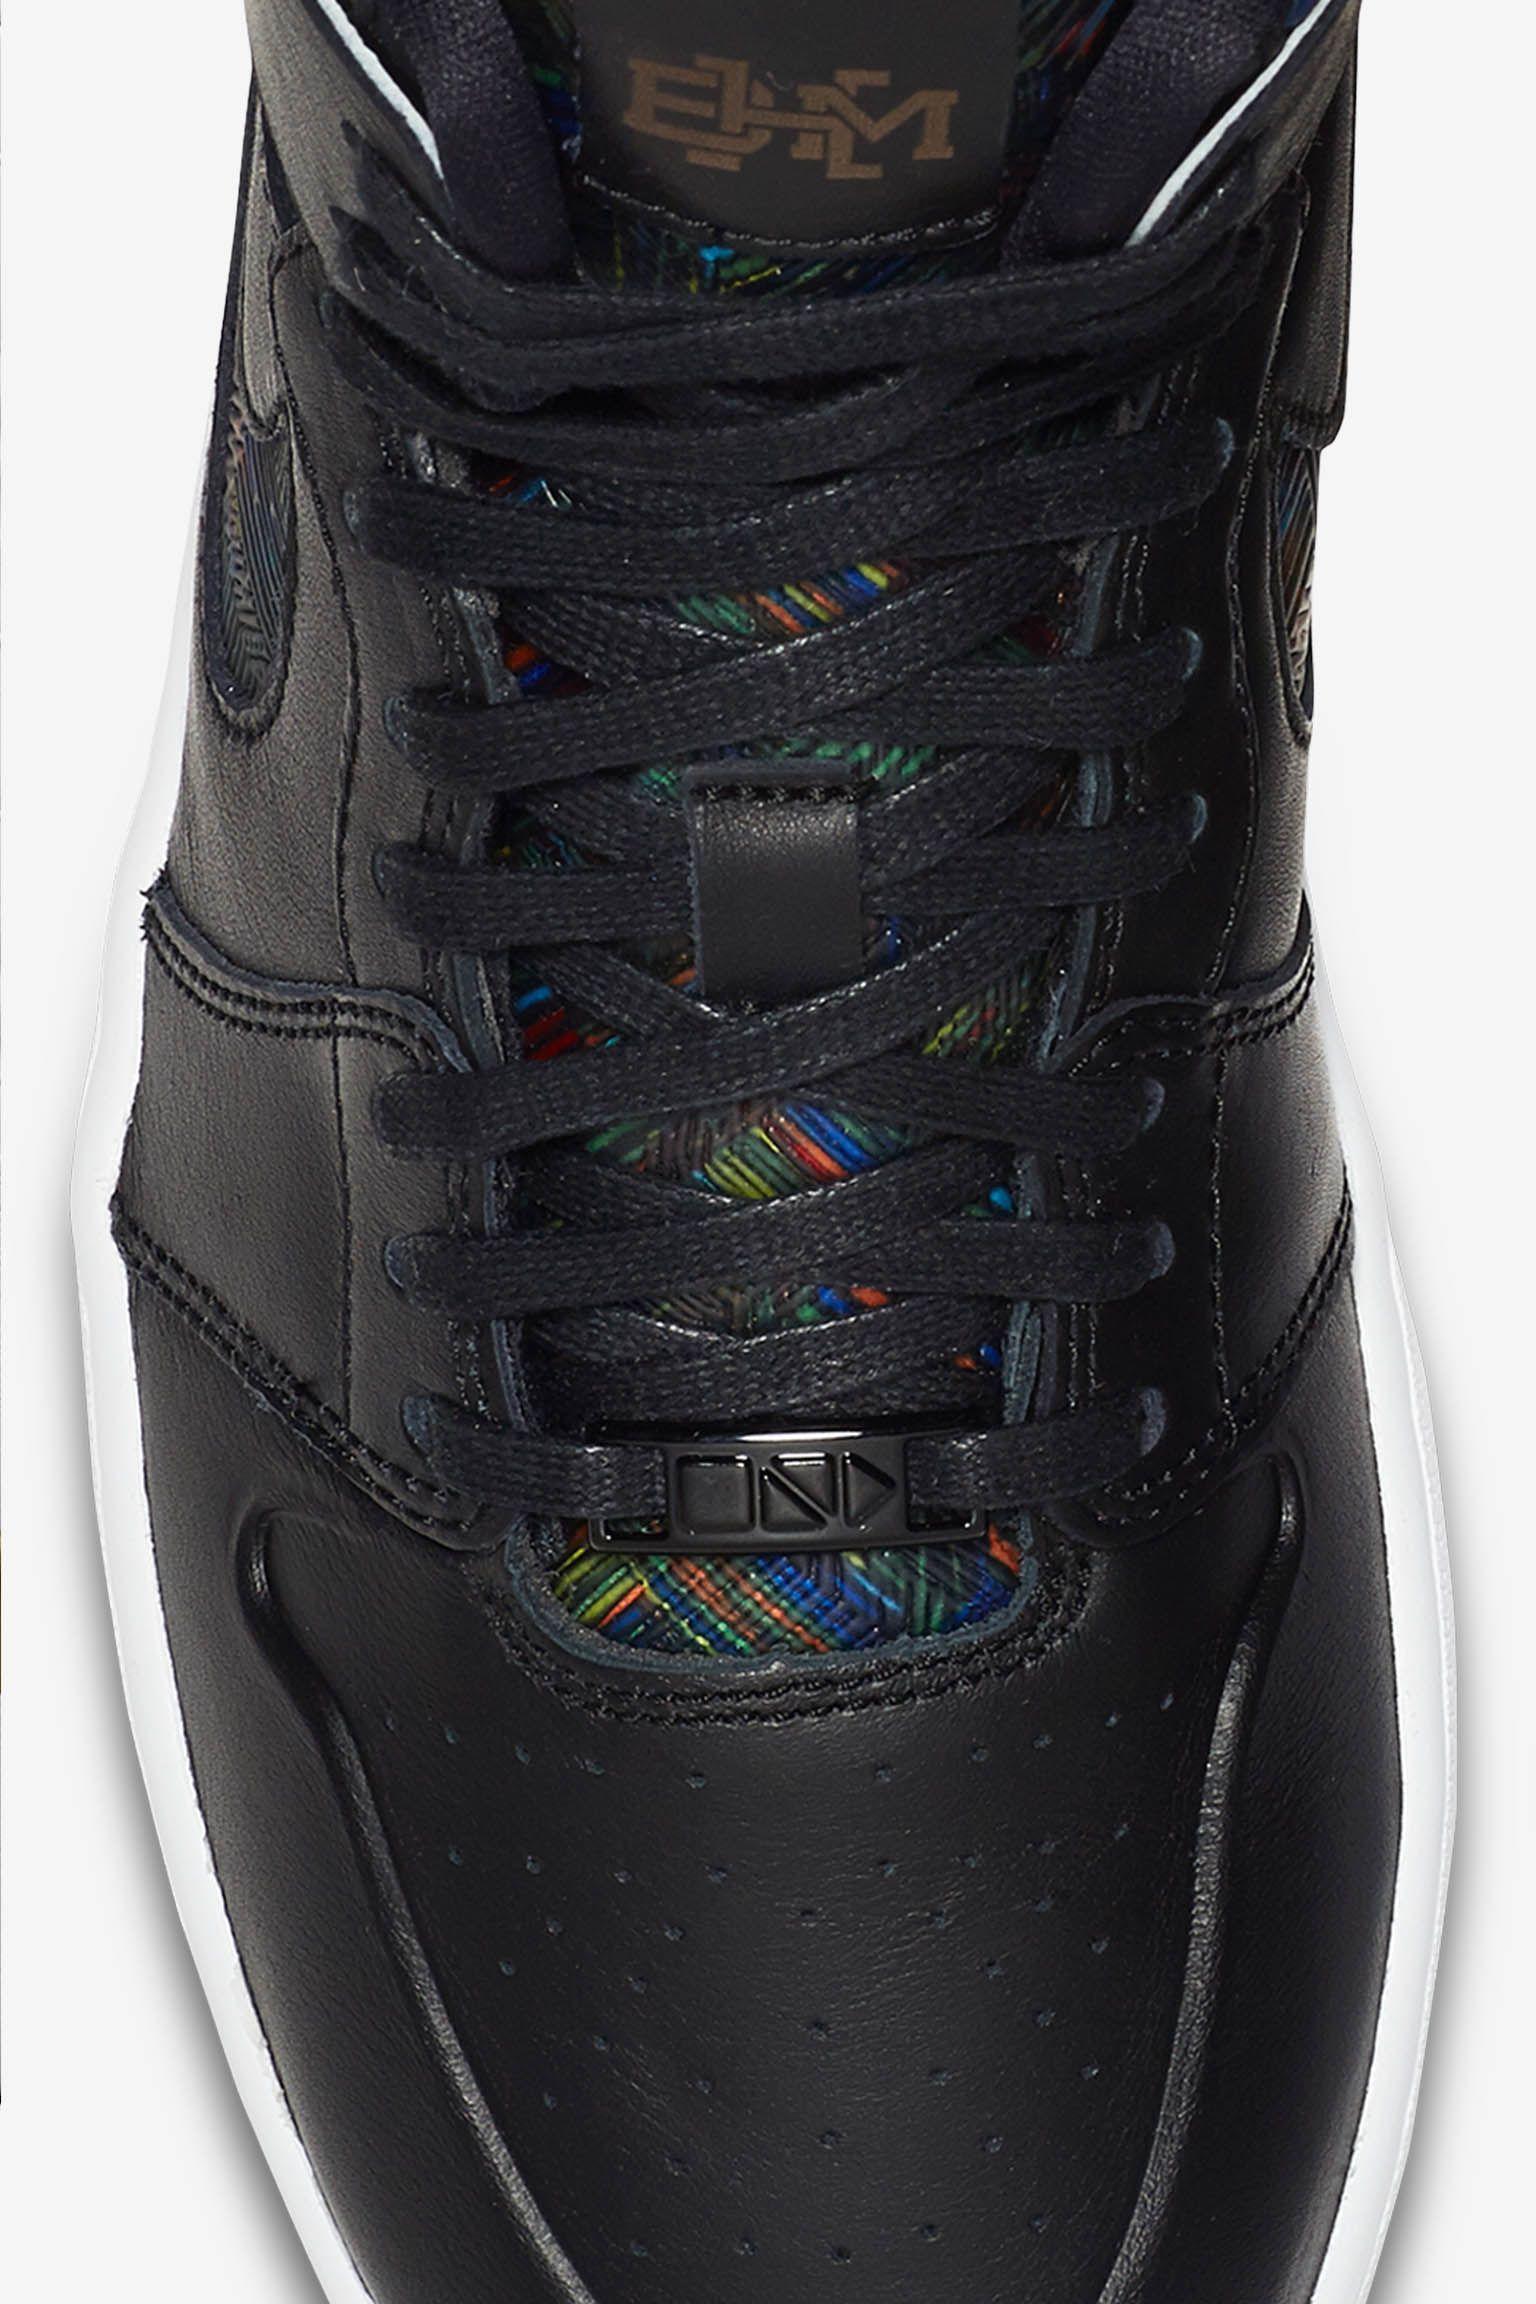 Air Jordan 1 Retro 'BHM' 2016 Release Date